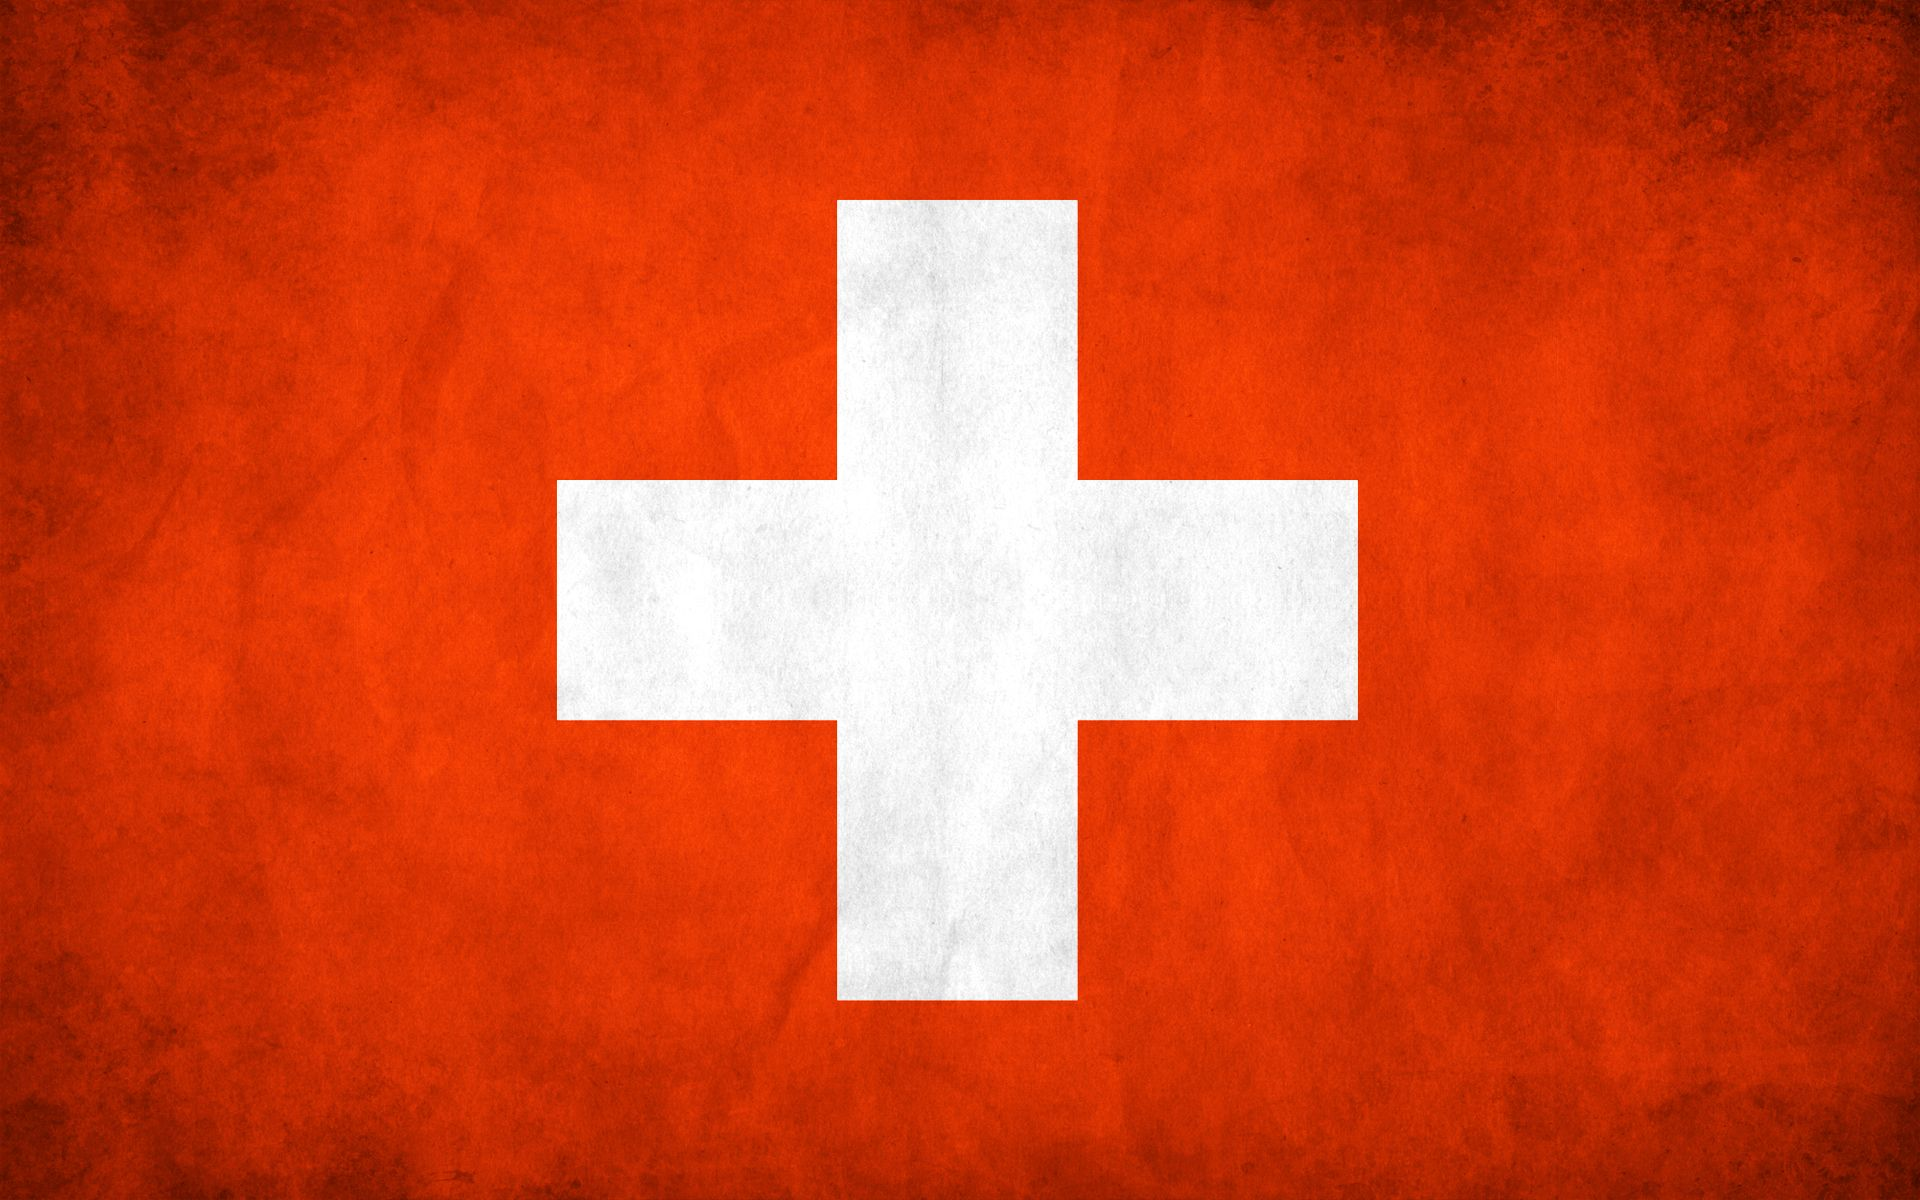 Switzerland grunge flag photo